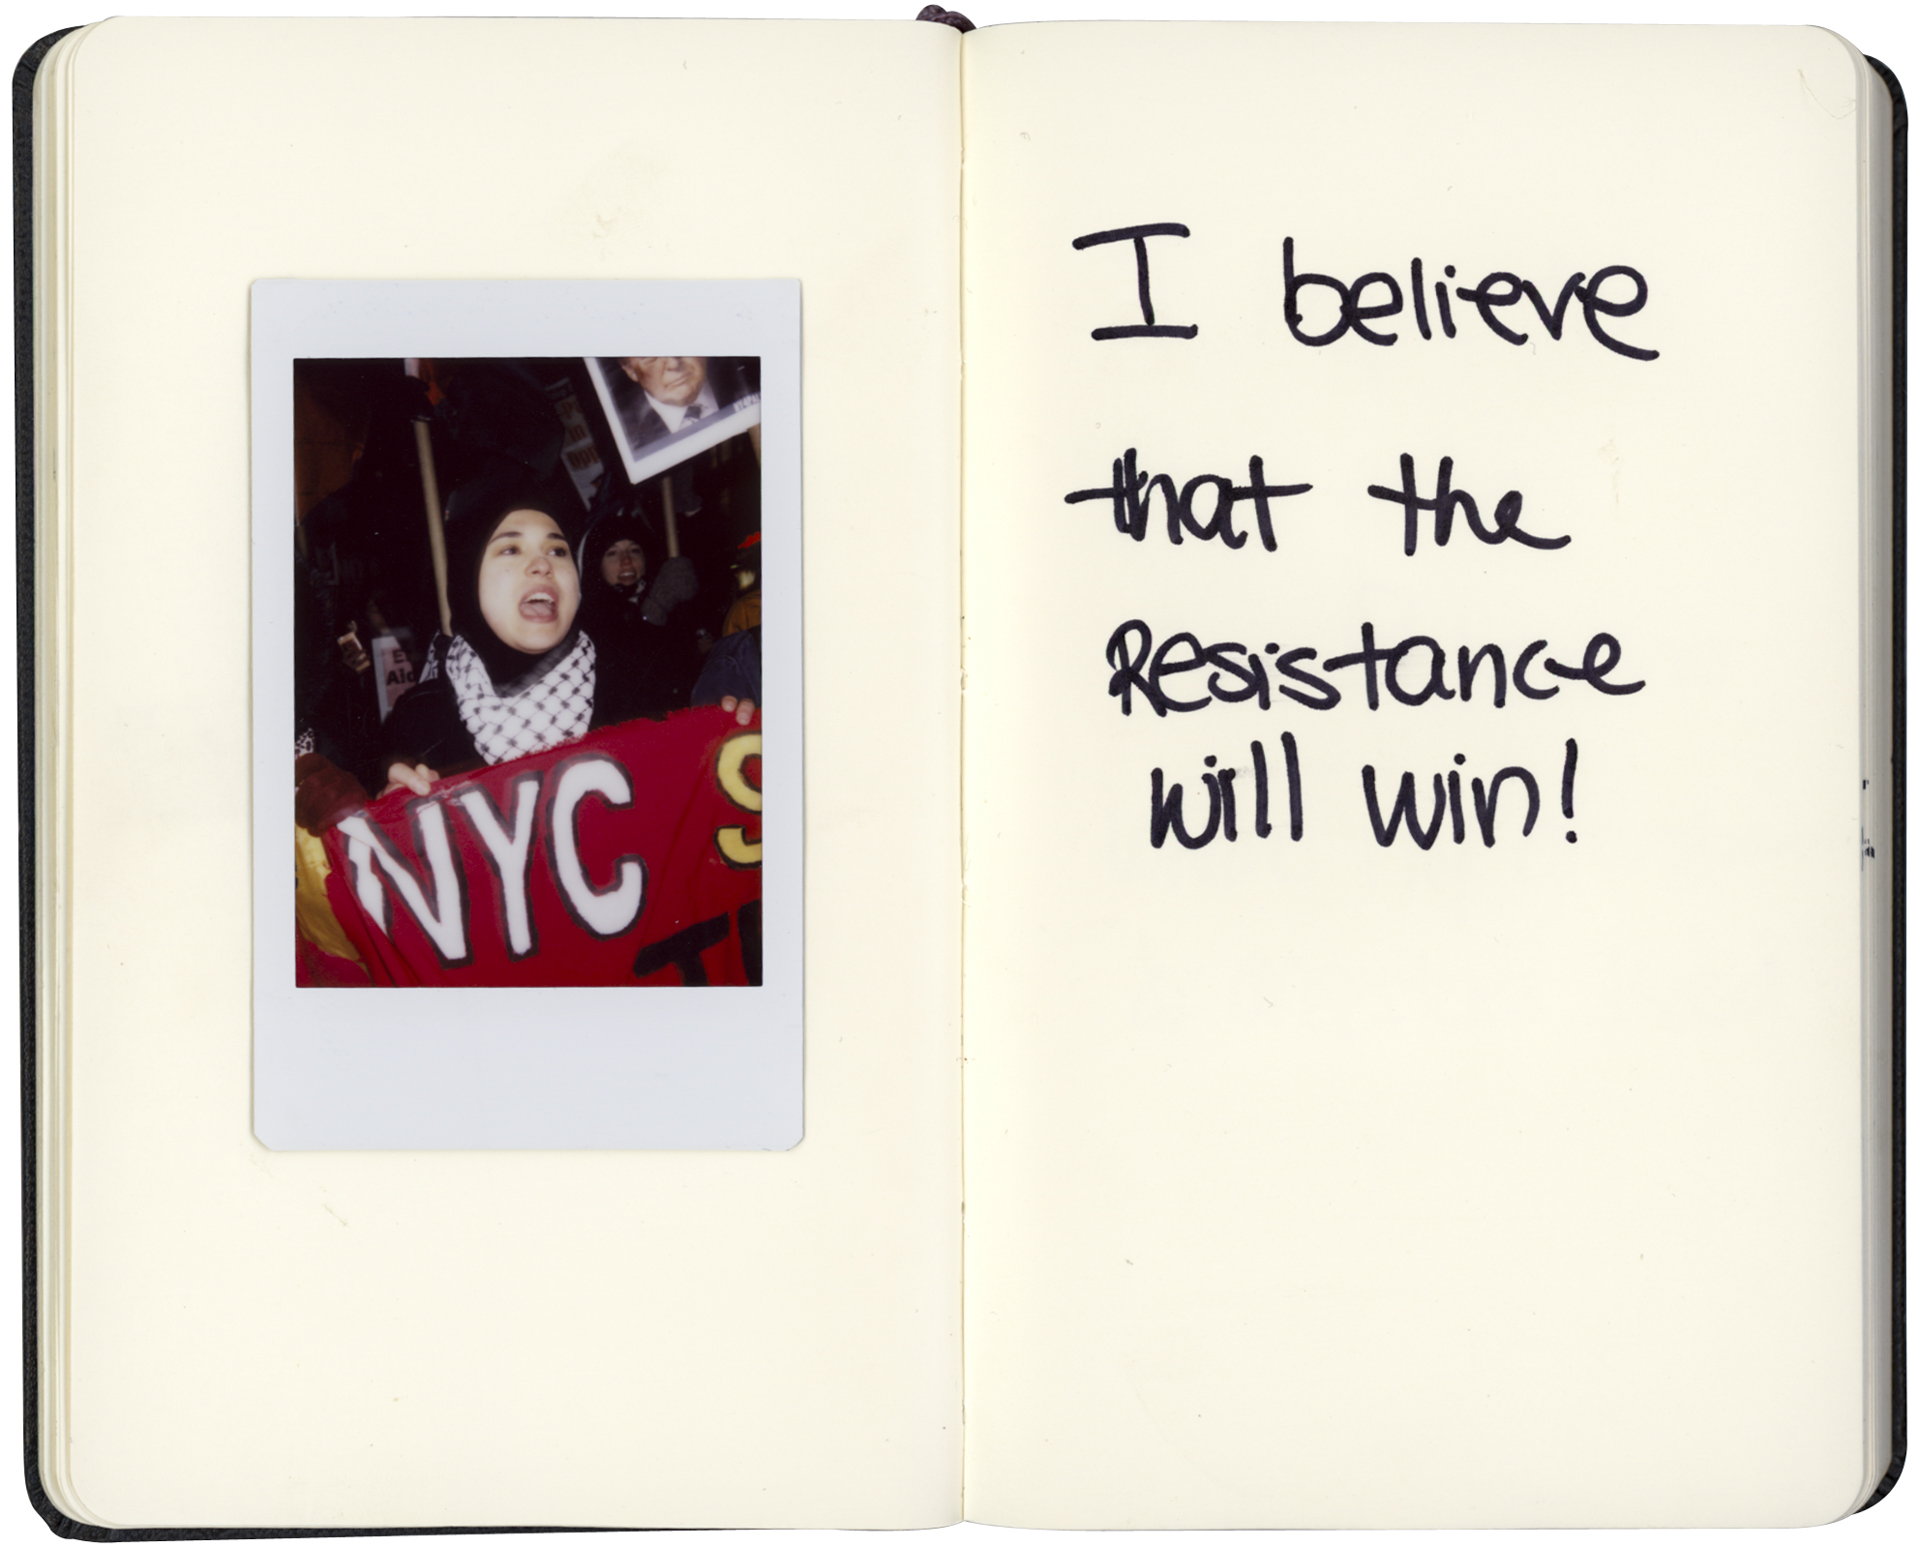 "15 Feb 2017 - Midtown, Manhattan - NYU Students for Justice in Palastine marchNadine Kawas, 20, student activist, Bensonhurst (Brooklyn)""I believe that the resistance will win!""Credit: Cédric von NiederhäusernINFO:Notebook digitally altered to fit layout dimensions"